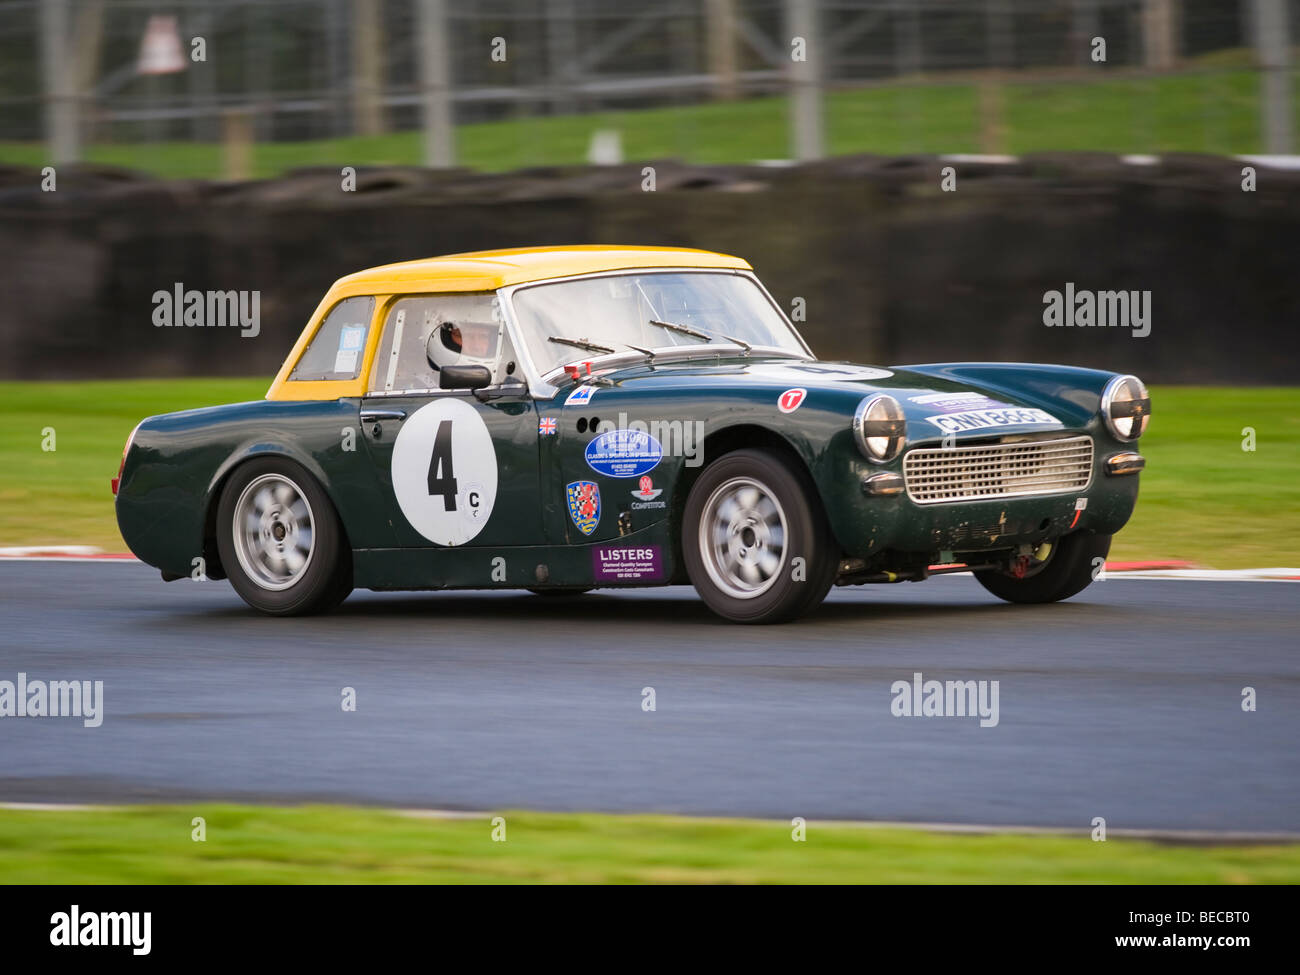 An Austin Healey Sprite Sports Car Racing at Oulton Park Motor Race ...